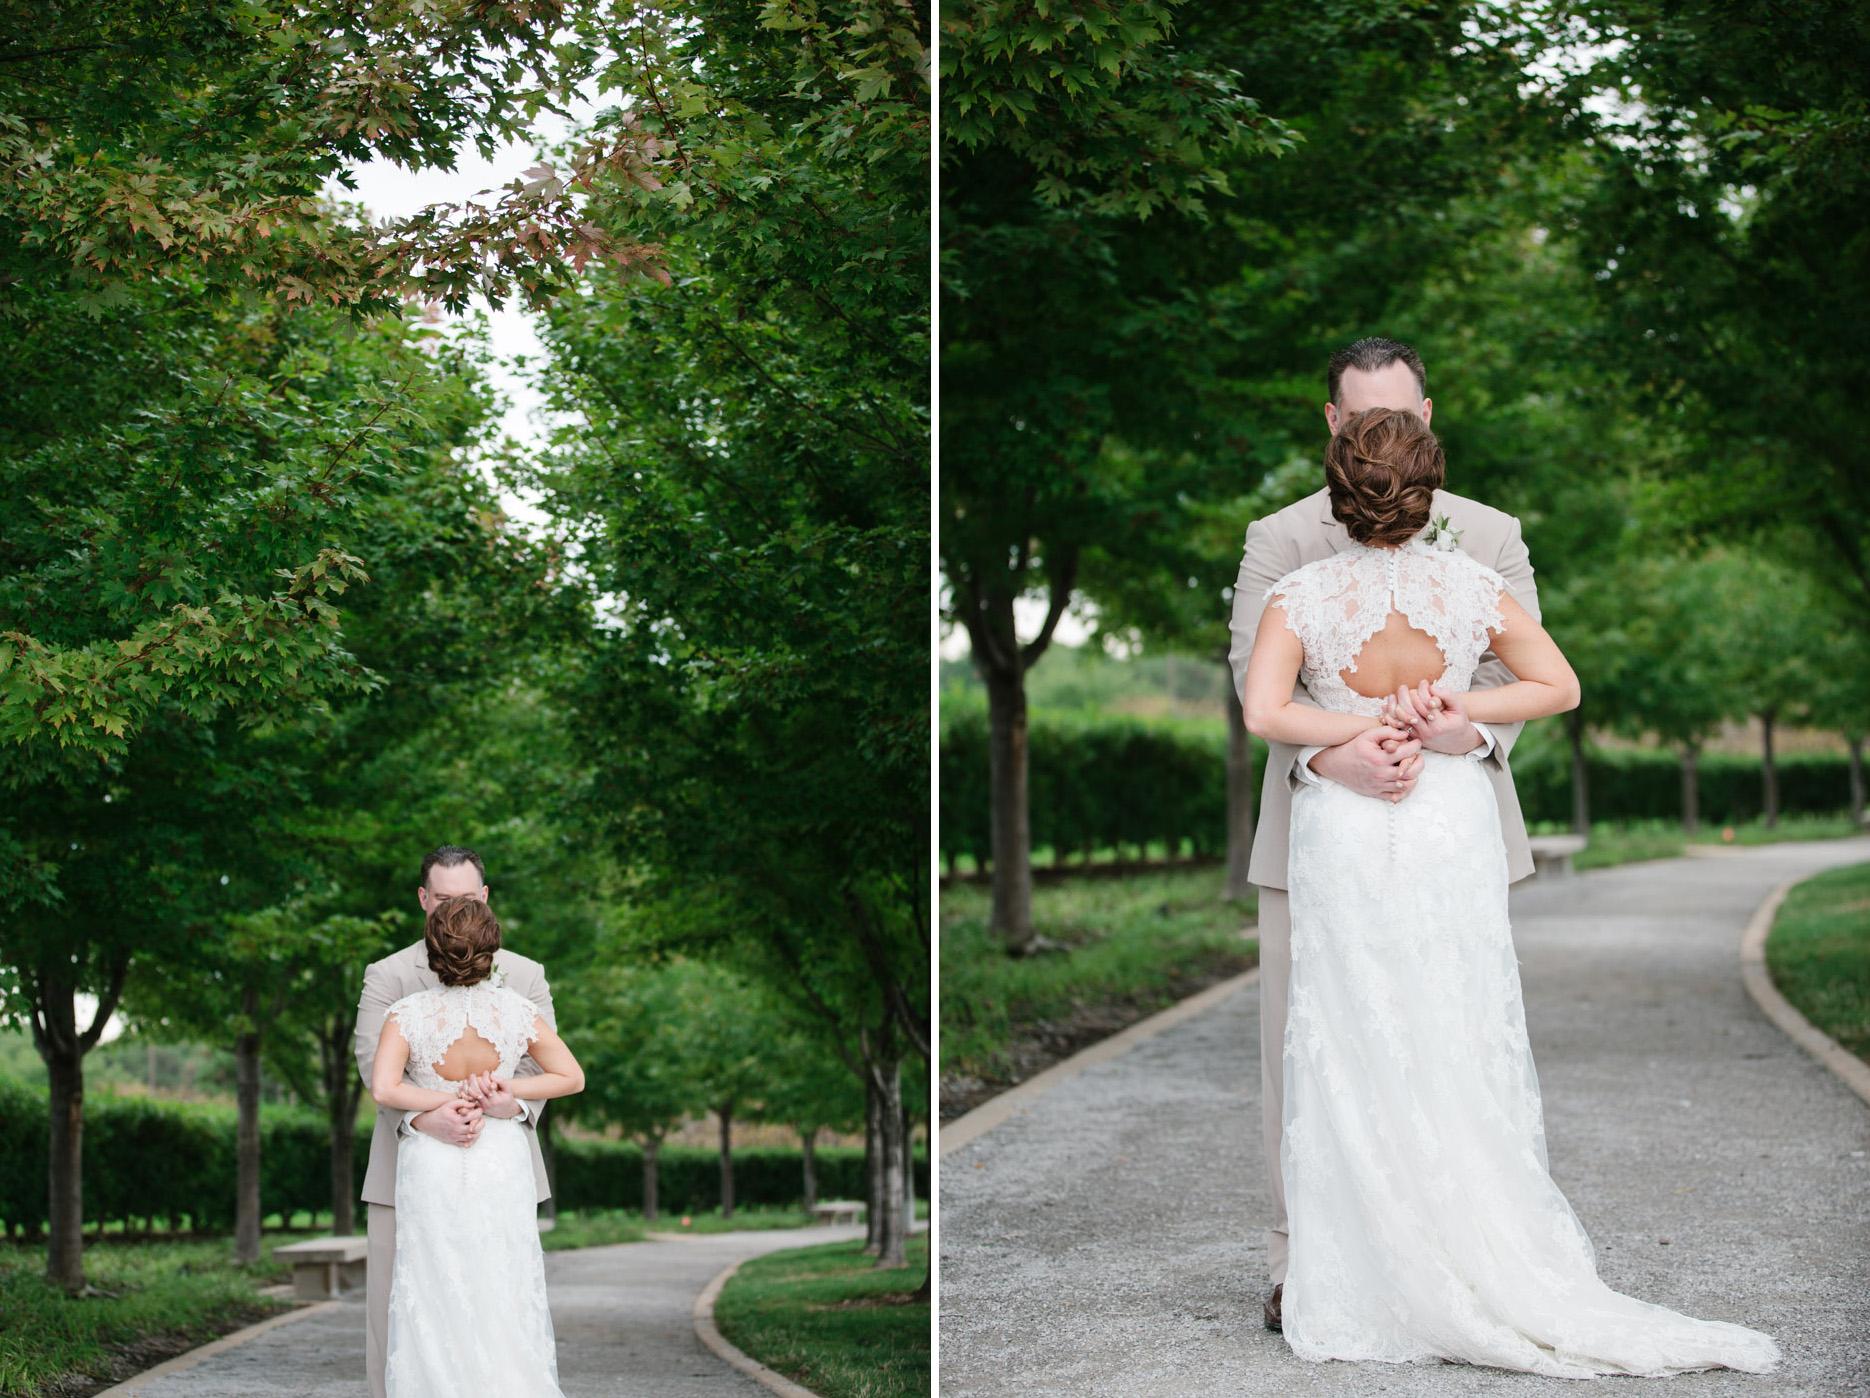 St-Louis-Wedding-Photography-1053-copy.jpg